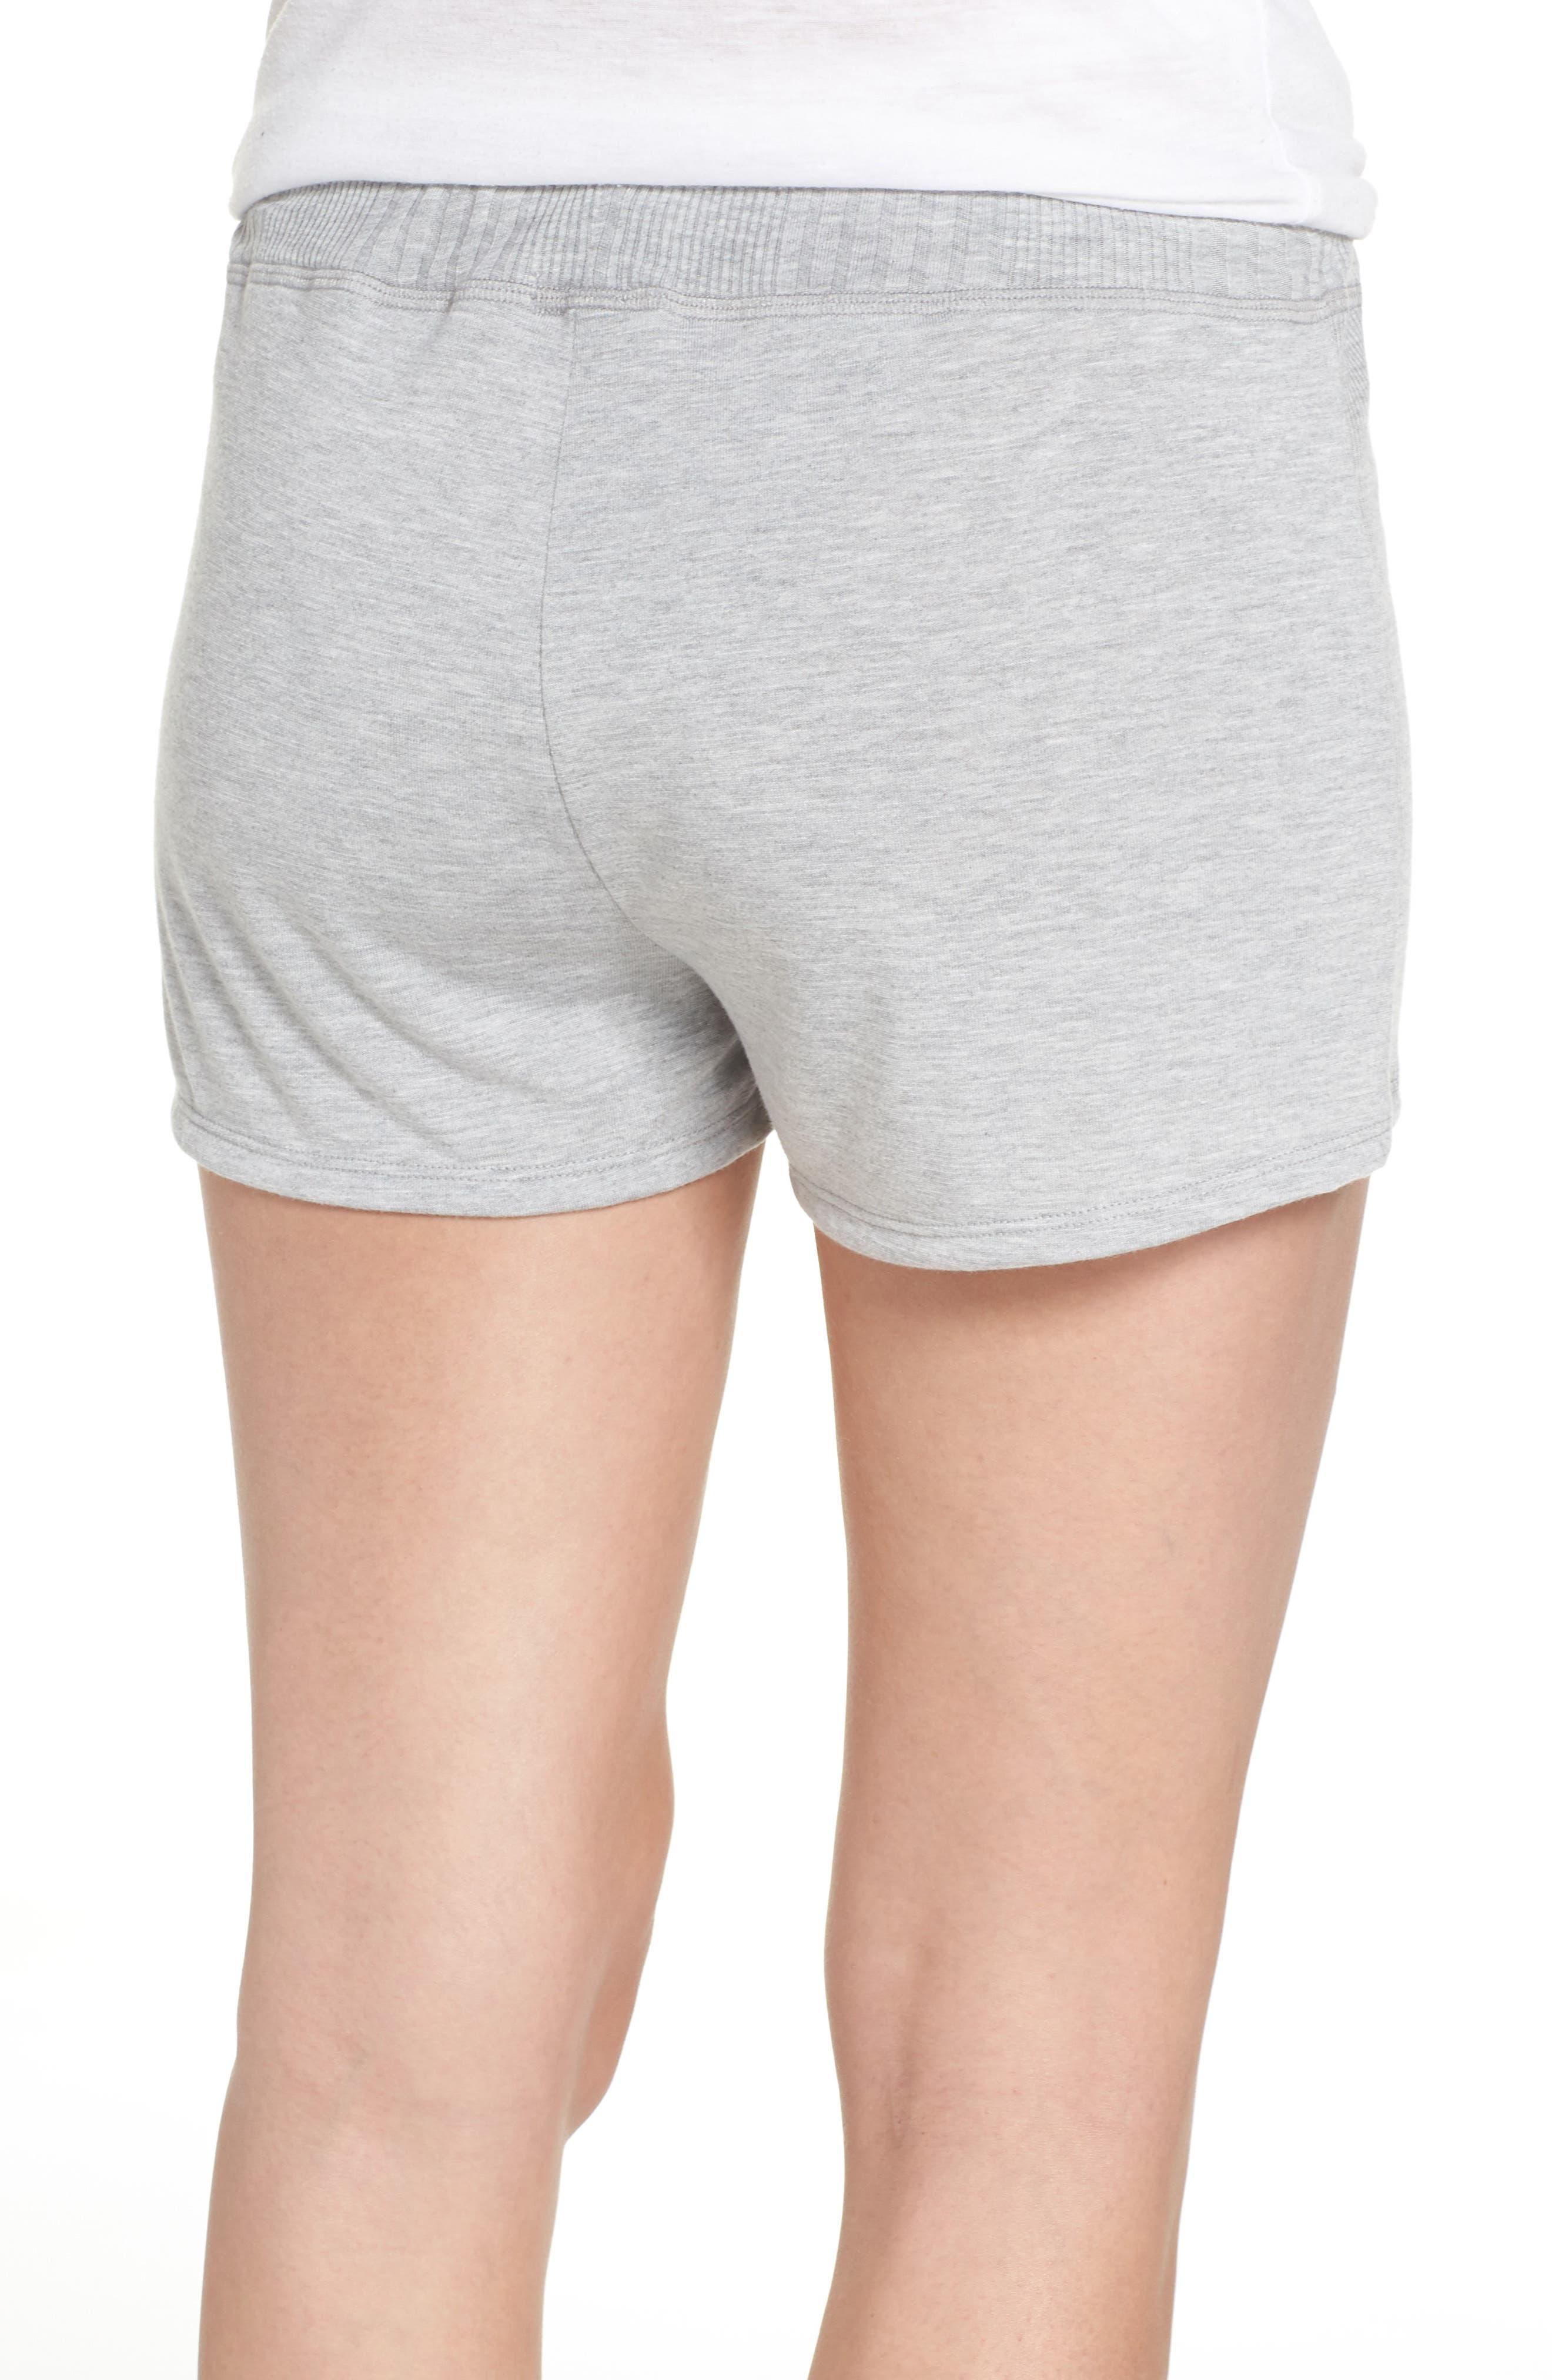 Pajama Shorts,                             Alternate thumbnail 2, color,                             LIGHT HEATHER GREY